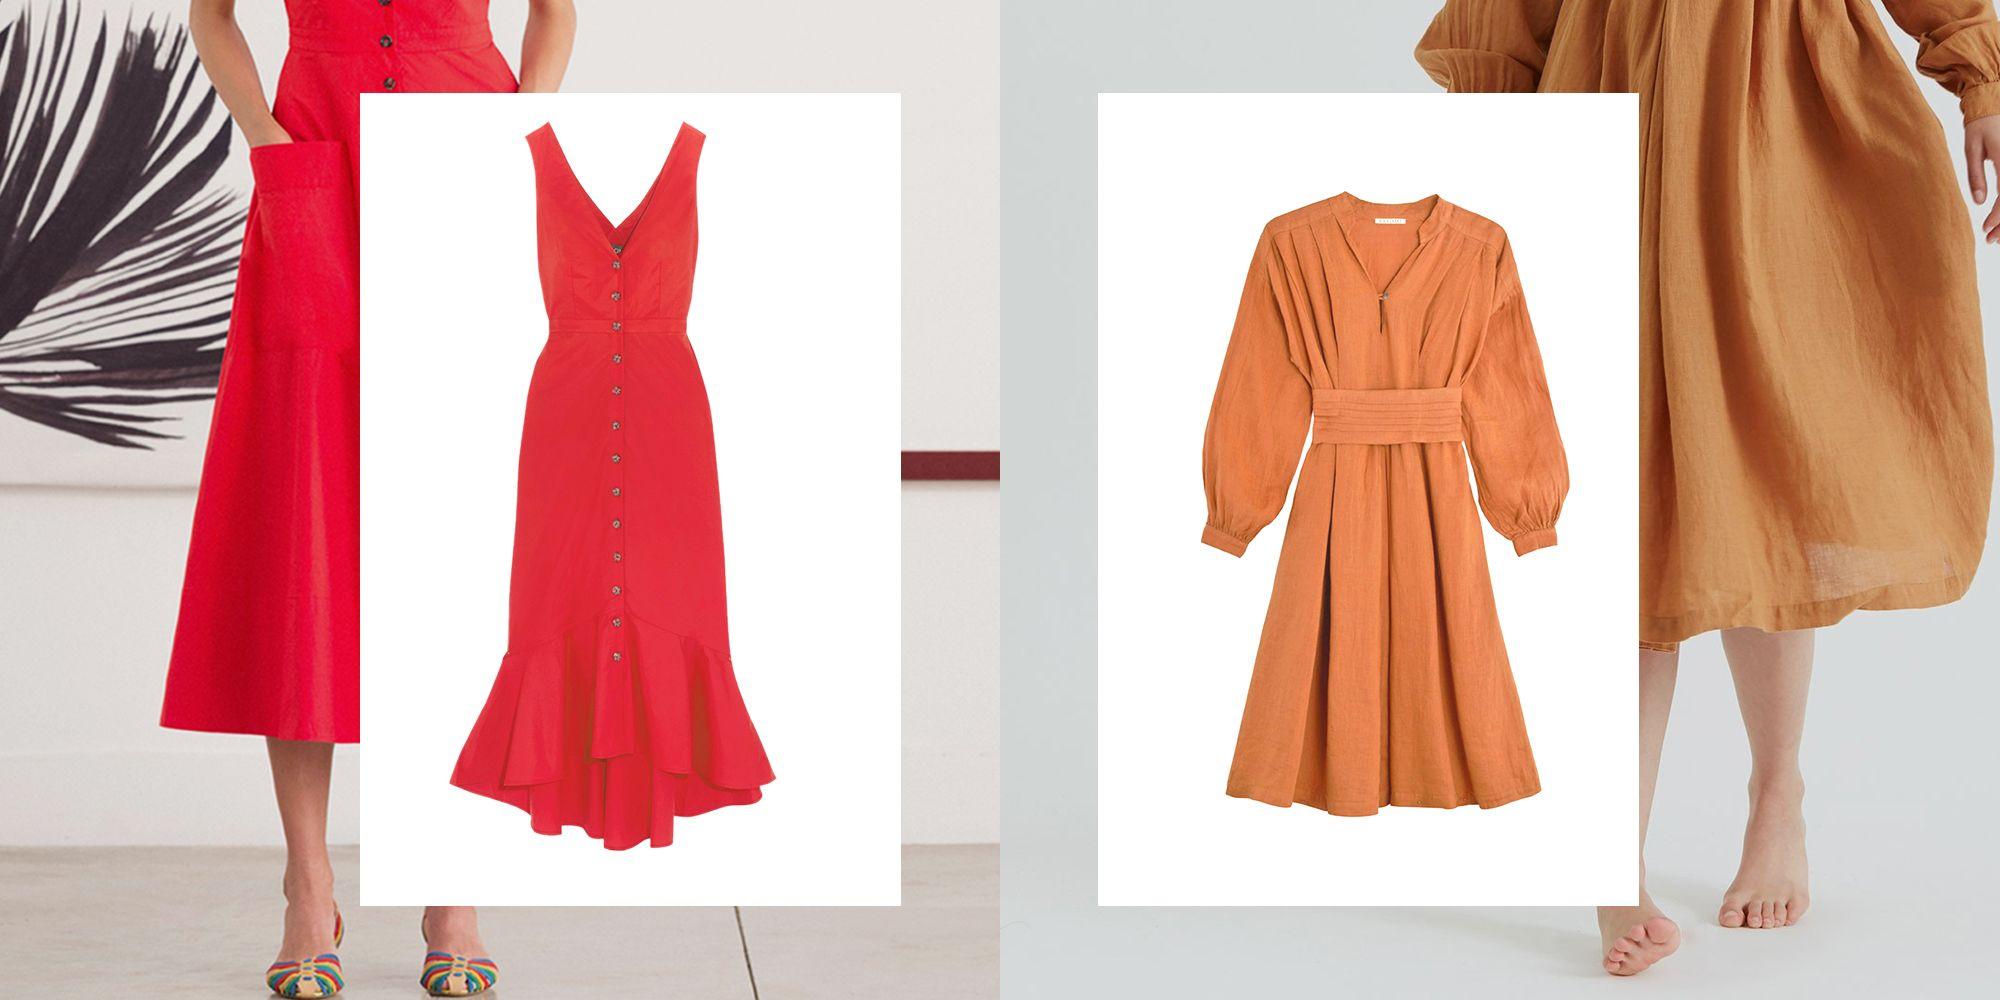 Girls in their summer dresses summary